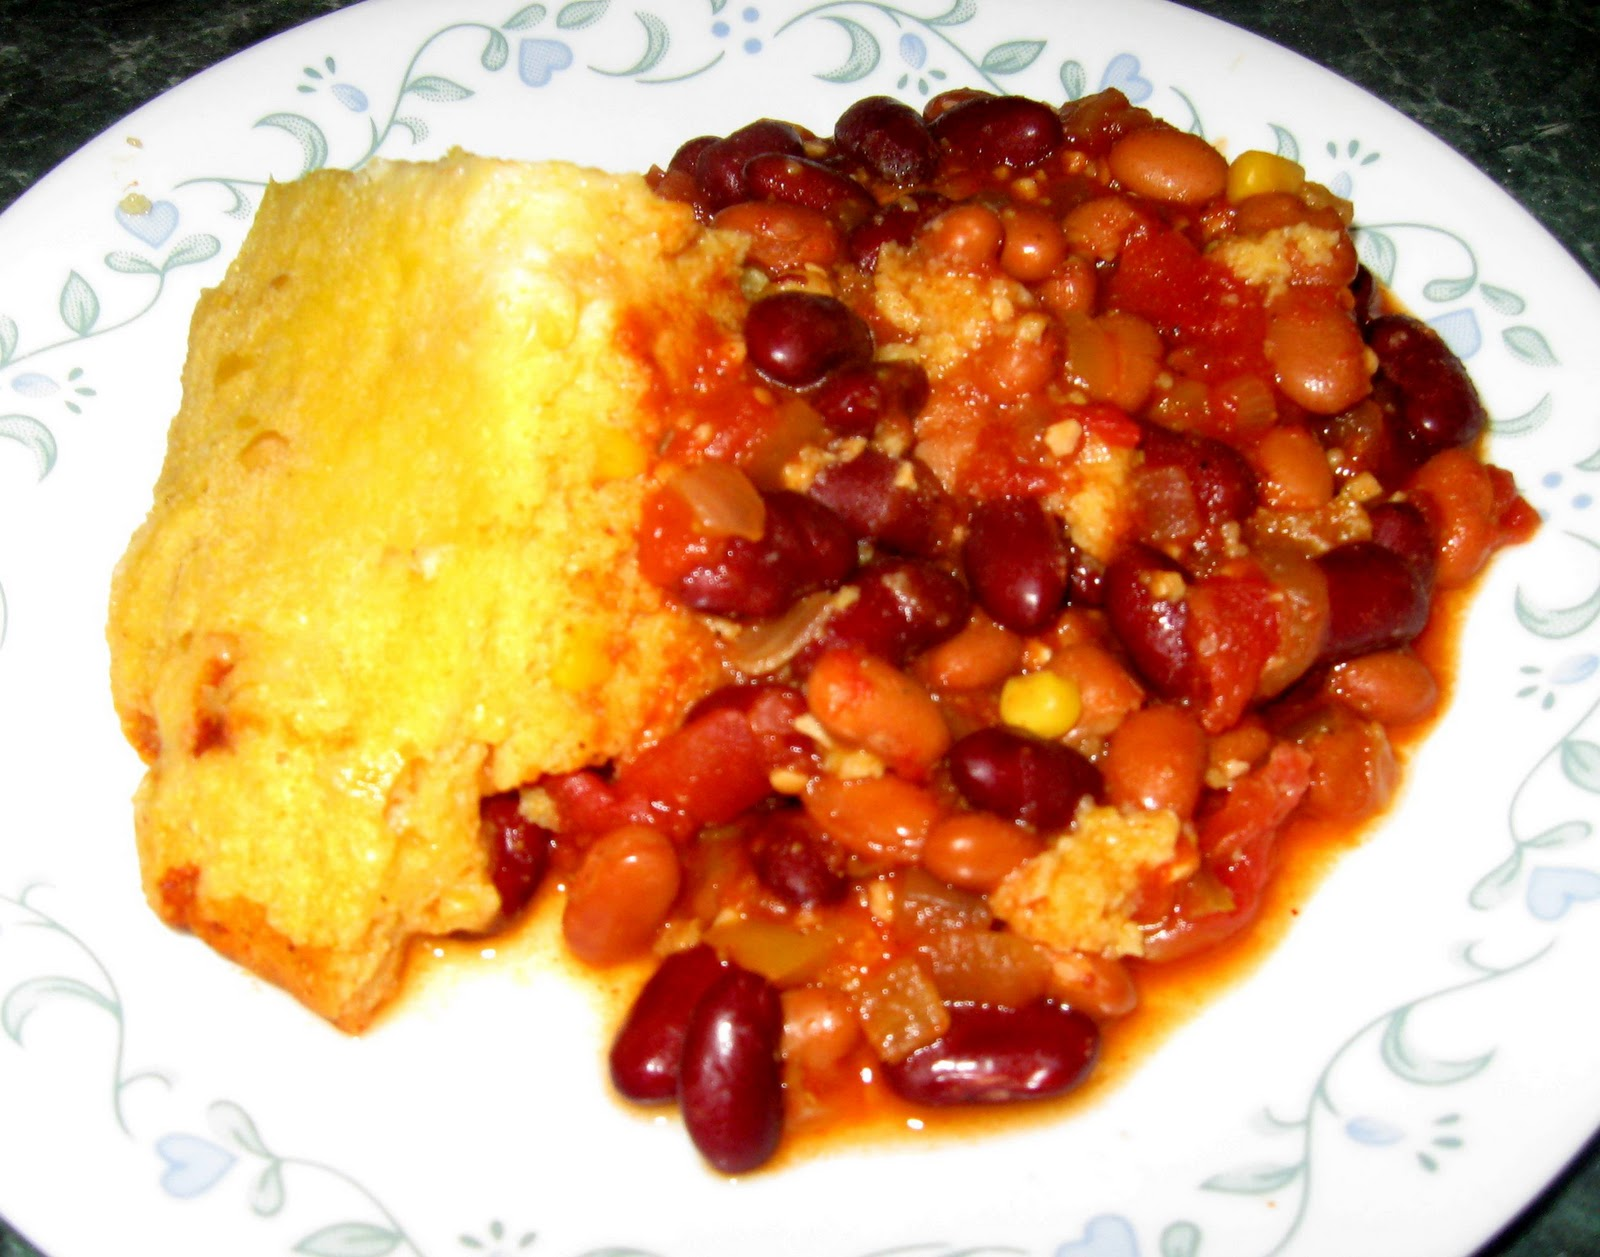 Bean+and+Cornbread+Casserole.jpg